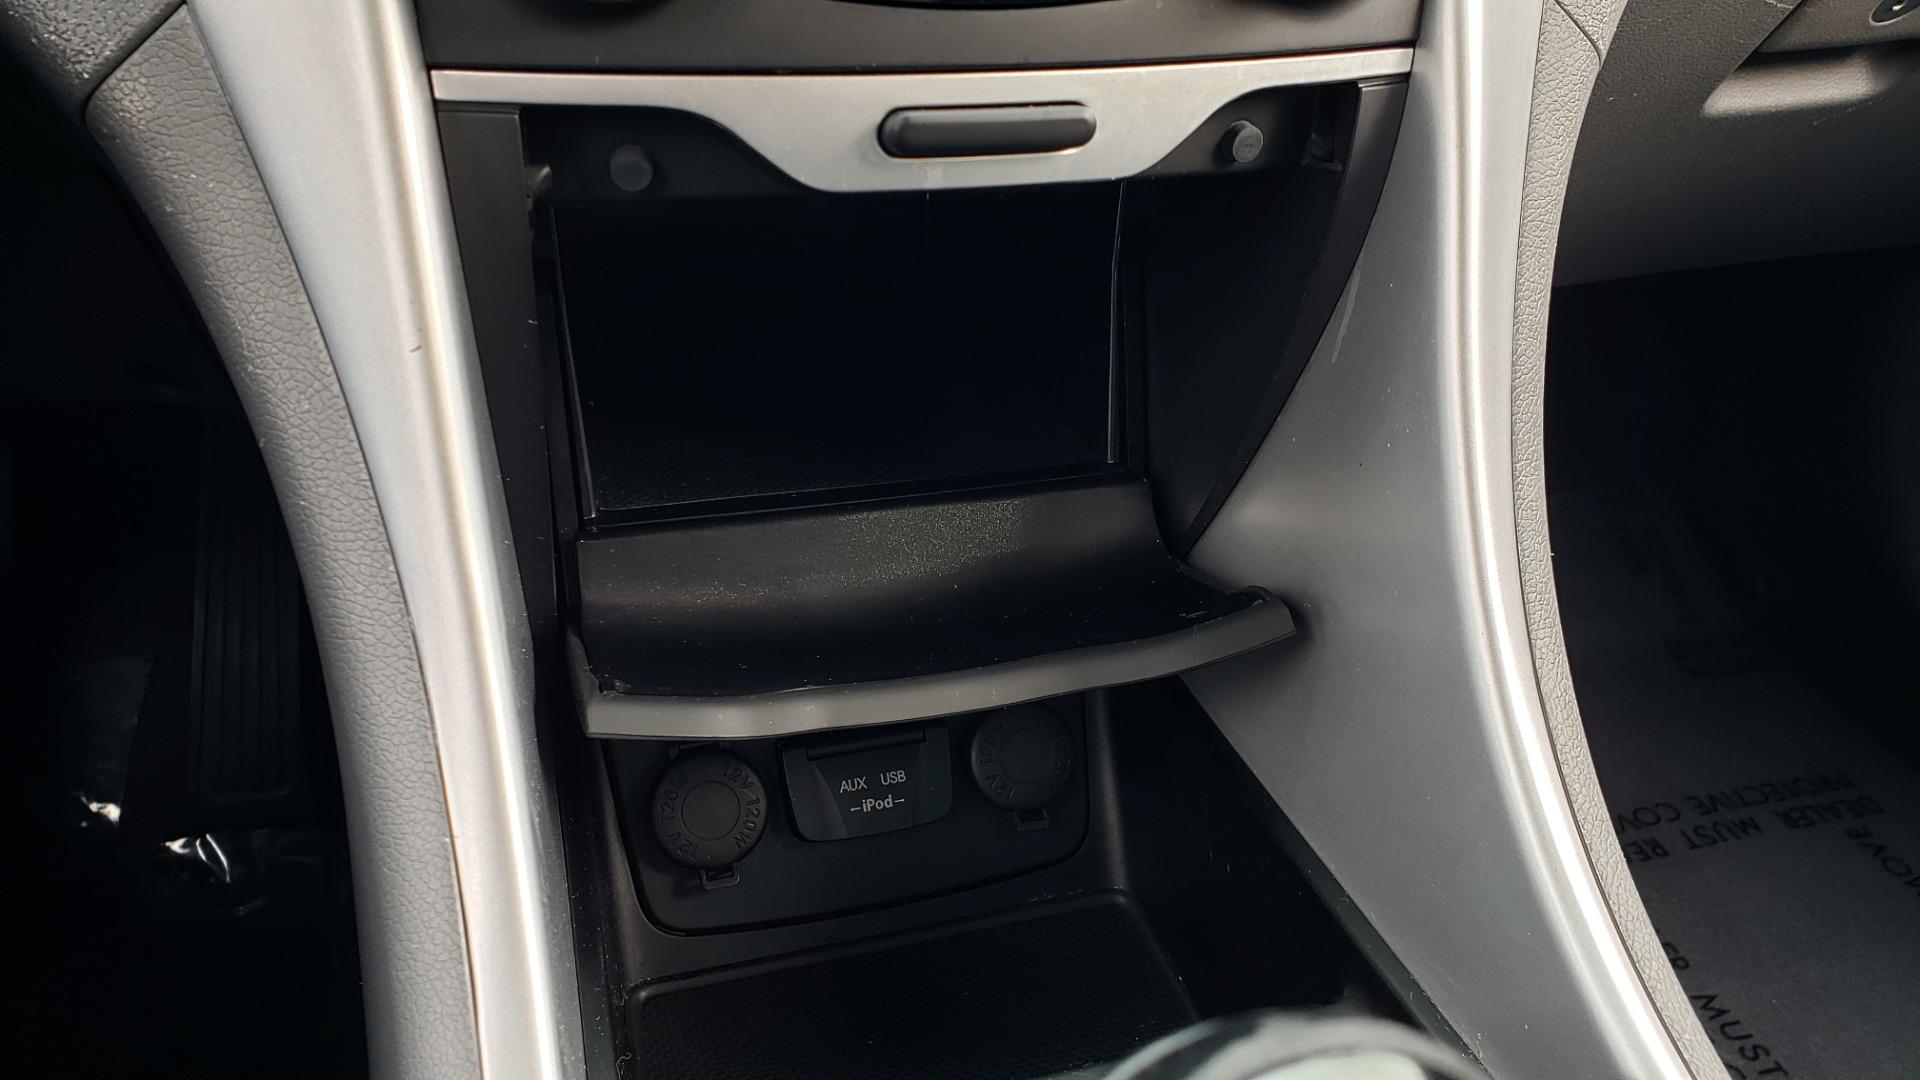 Used 2013 Hyundai SONATA SE AUTO / 2.4L 4-CYL / 6-SPD AUTO / VERY CLEAN for sale Sold at Formula Imports in Charlotte NC 28227 44